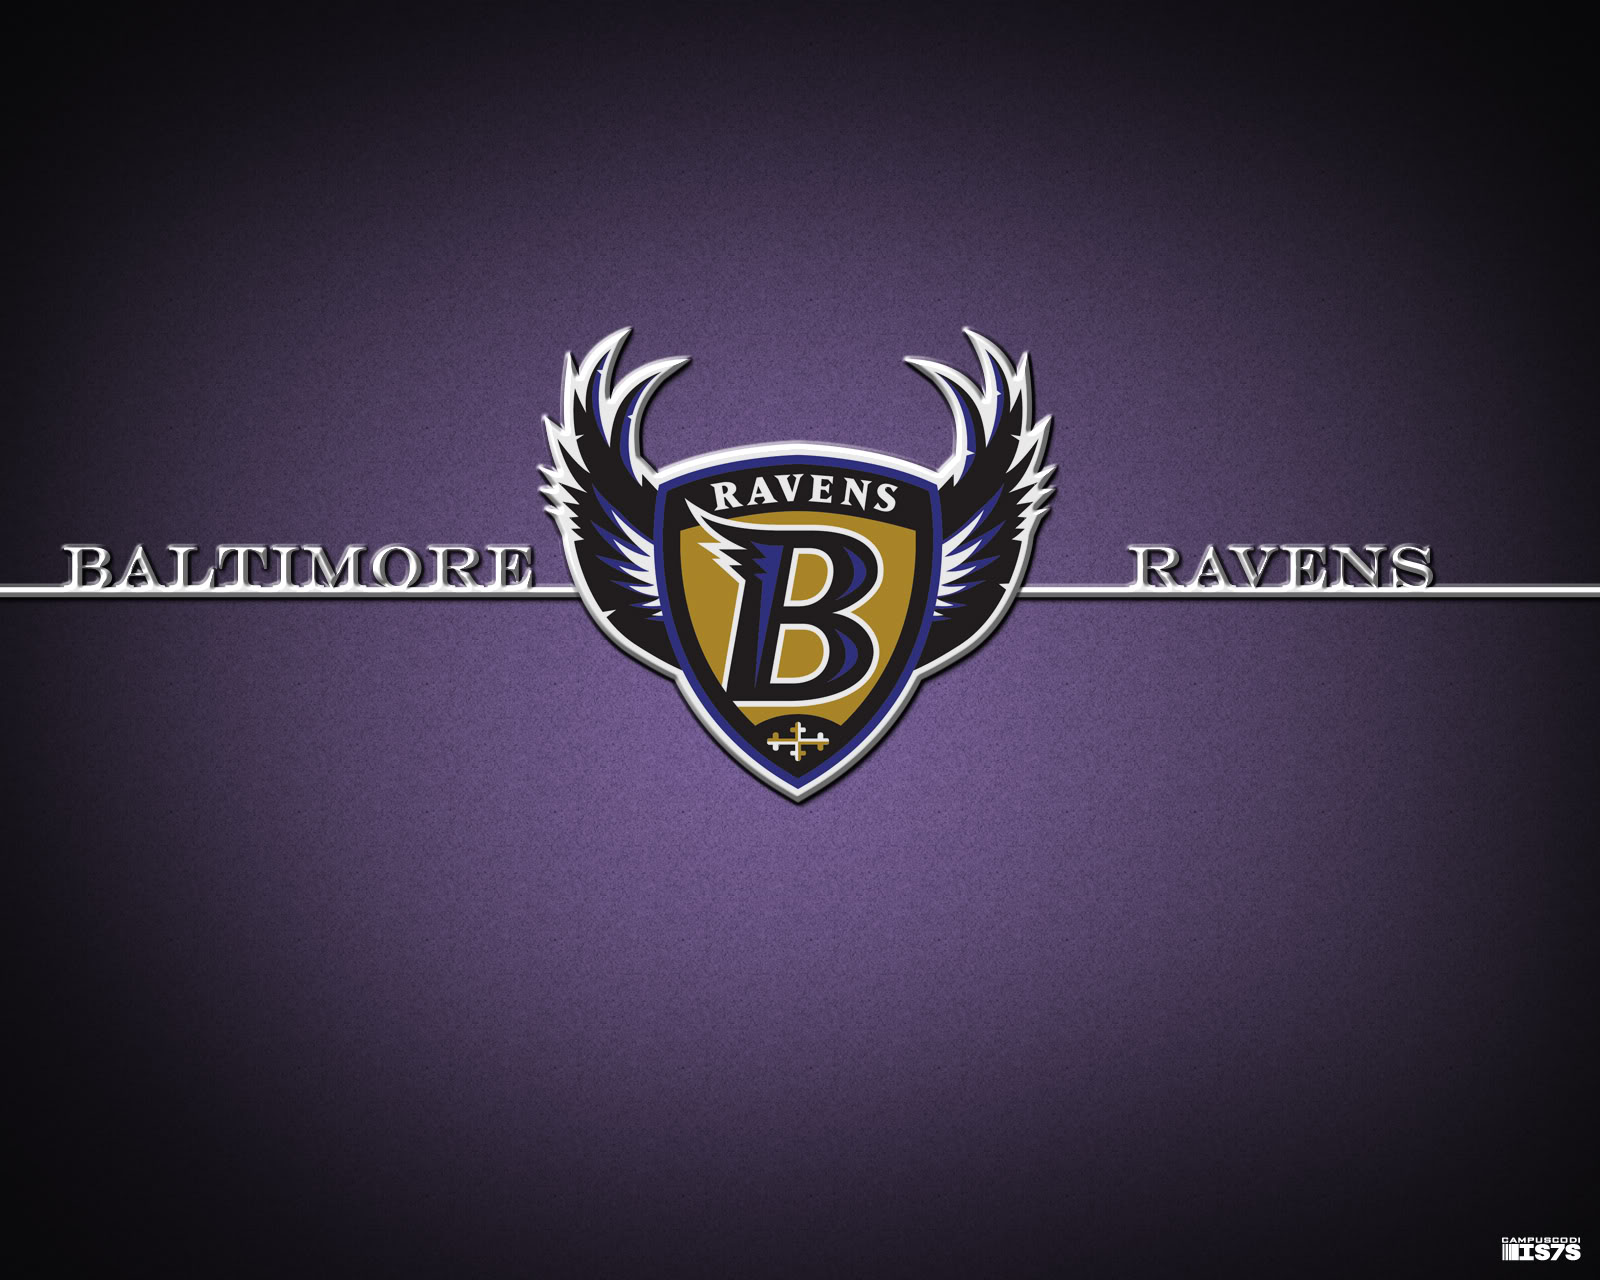 Baltimore Ravens wallpaper HD desktop wallpaper Baltimore Ravens 1600x1280